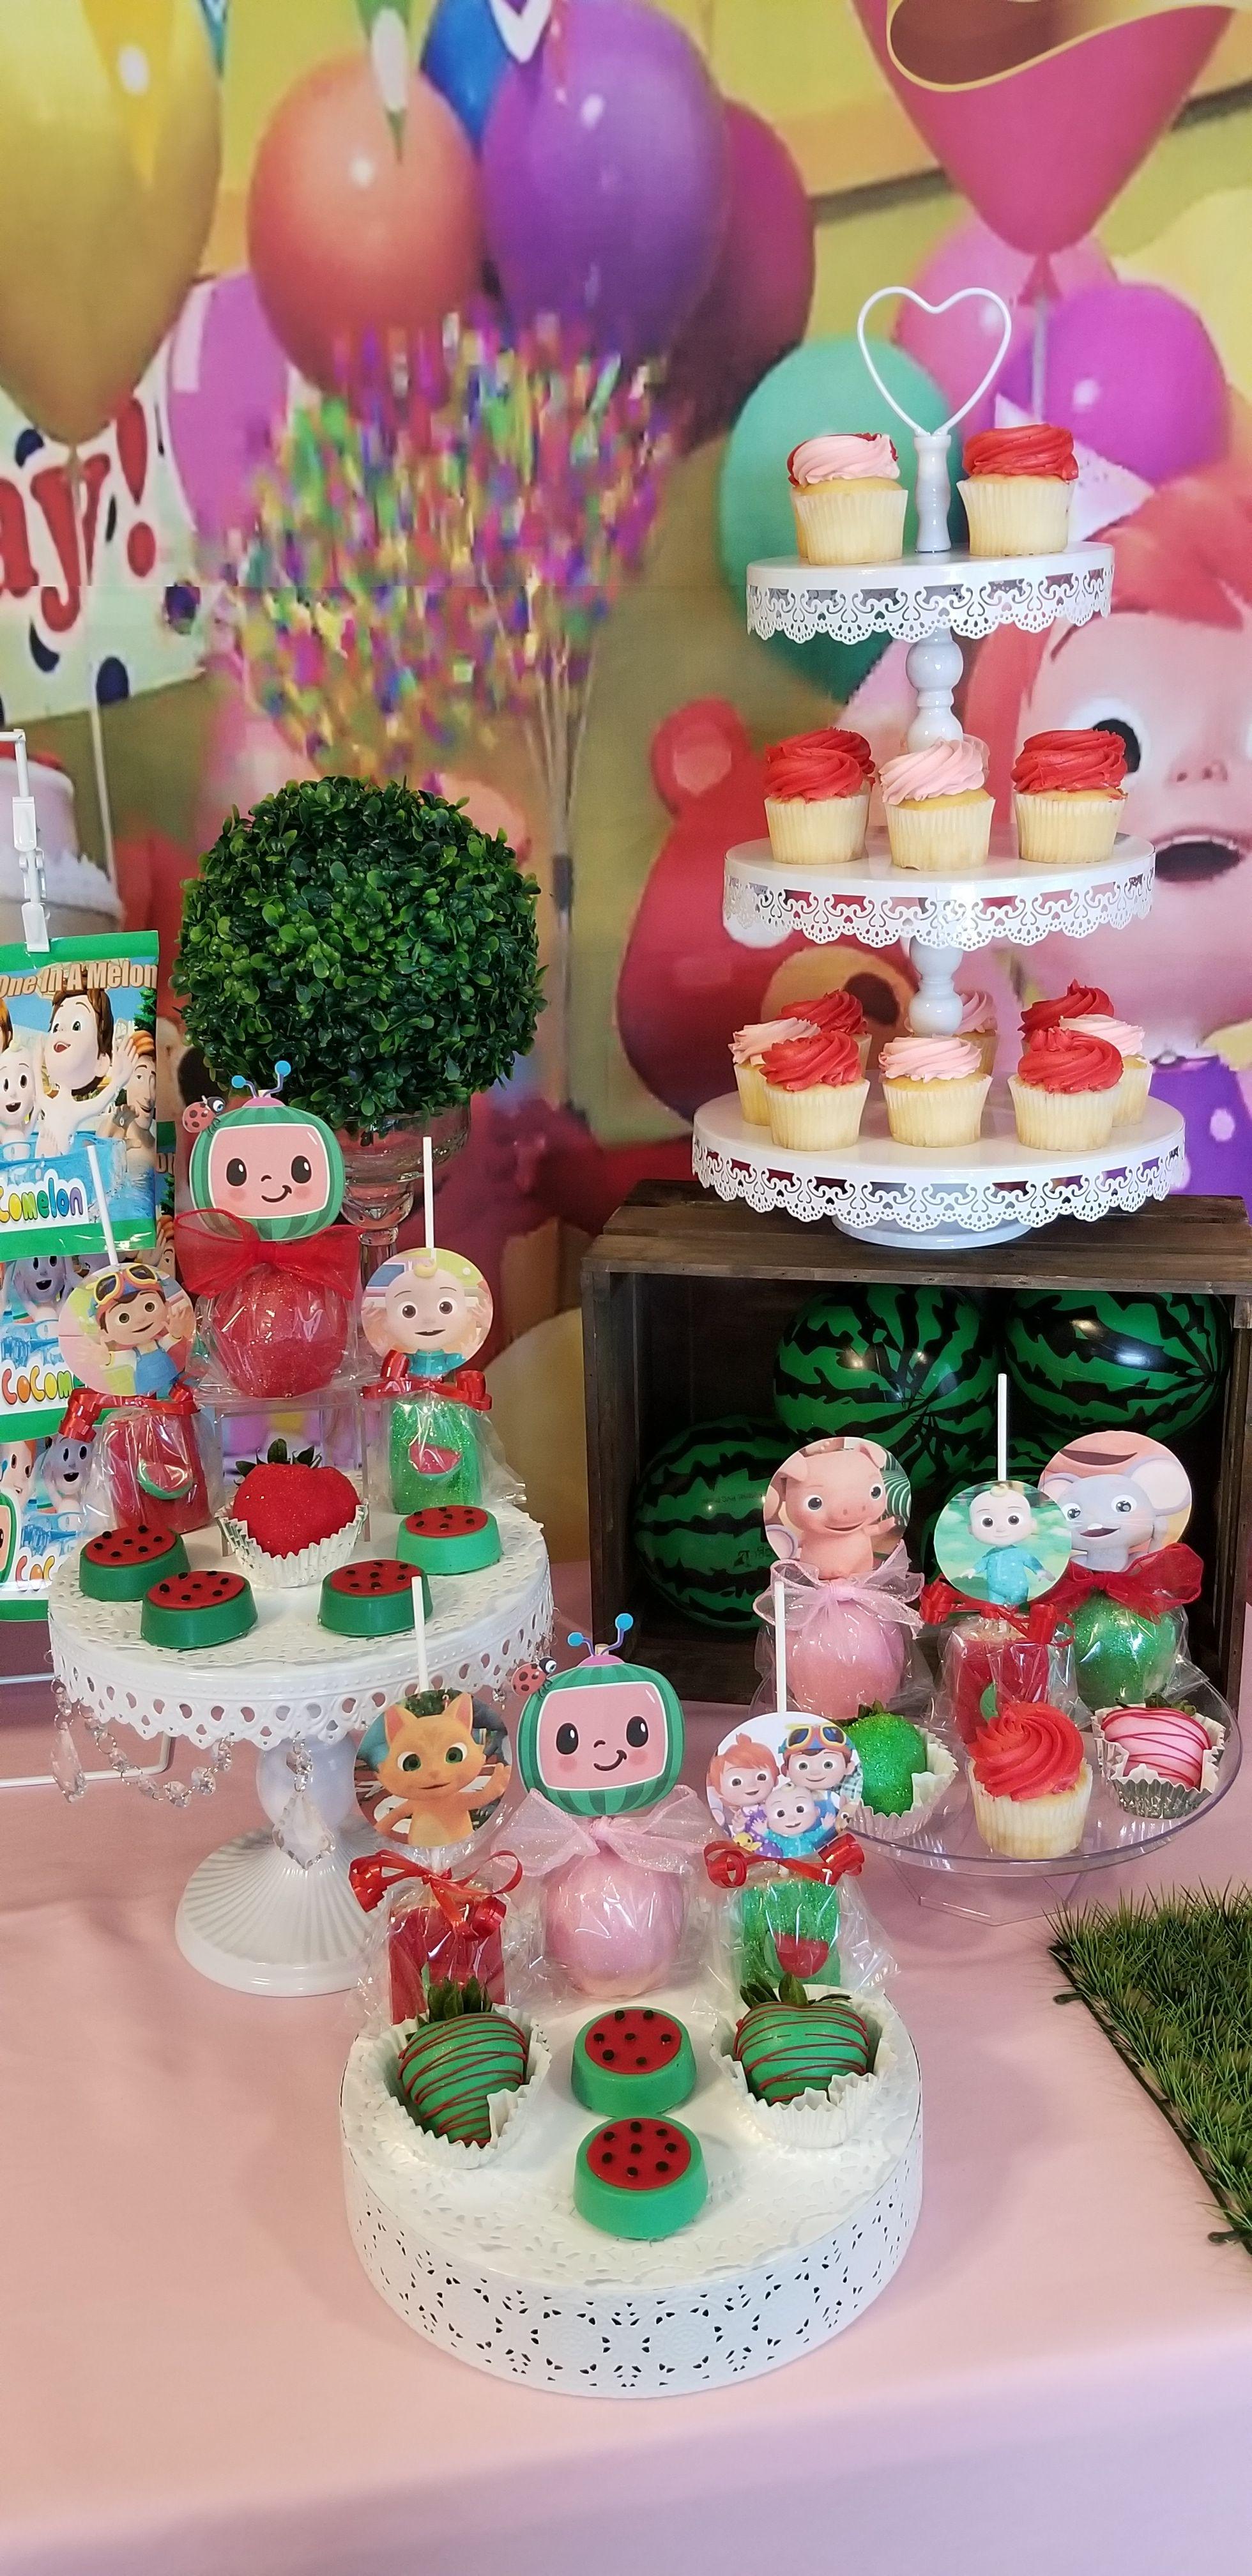 Cocomelon Dessert Table Decorations Fiesta Birthday Party 1st Birthday Decorations 2nd Birthday Party Themes